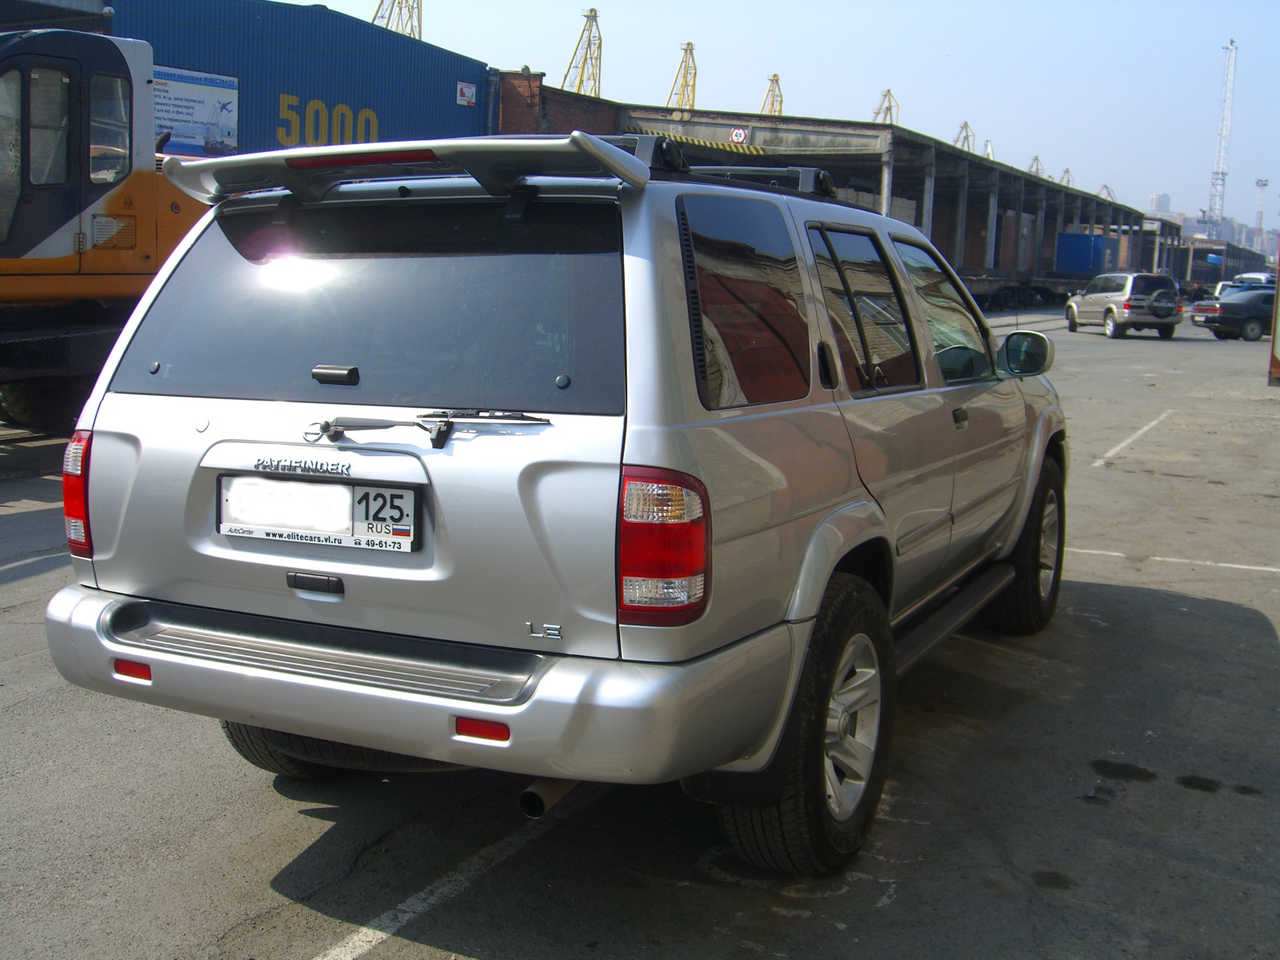 2002 nissan pathfinder specs engine size 3 5 fuel type gasoline transmission gearbox automatic 2002 nissan pathfinder specs engine